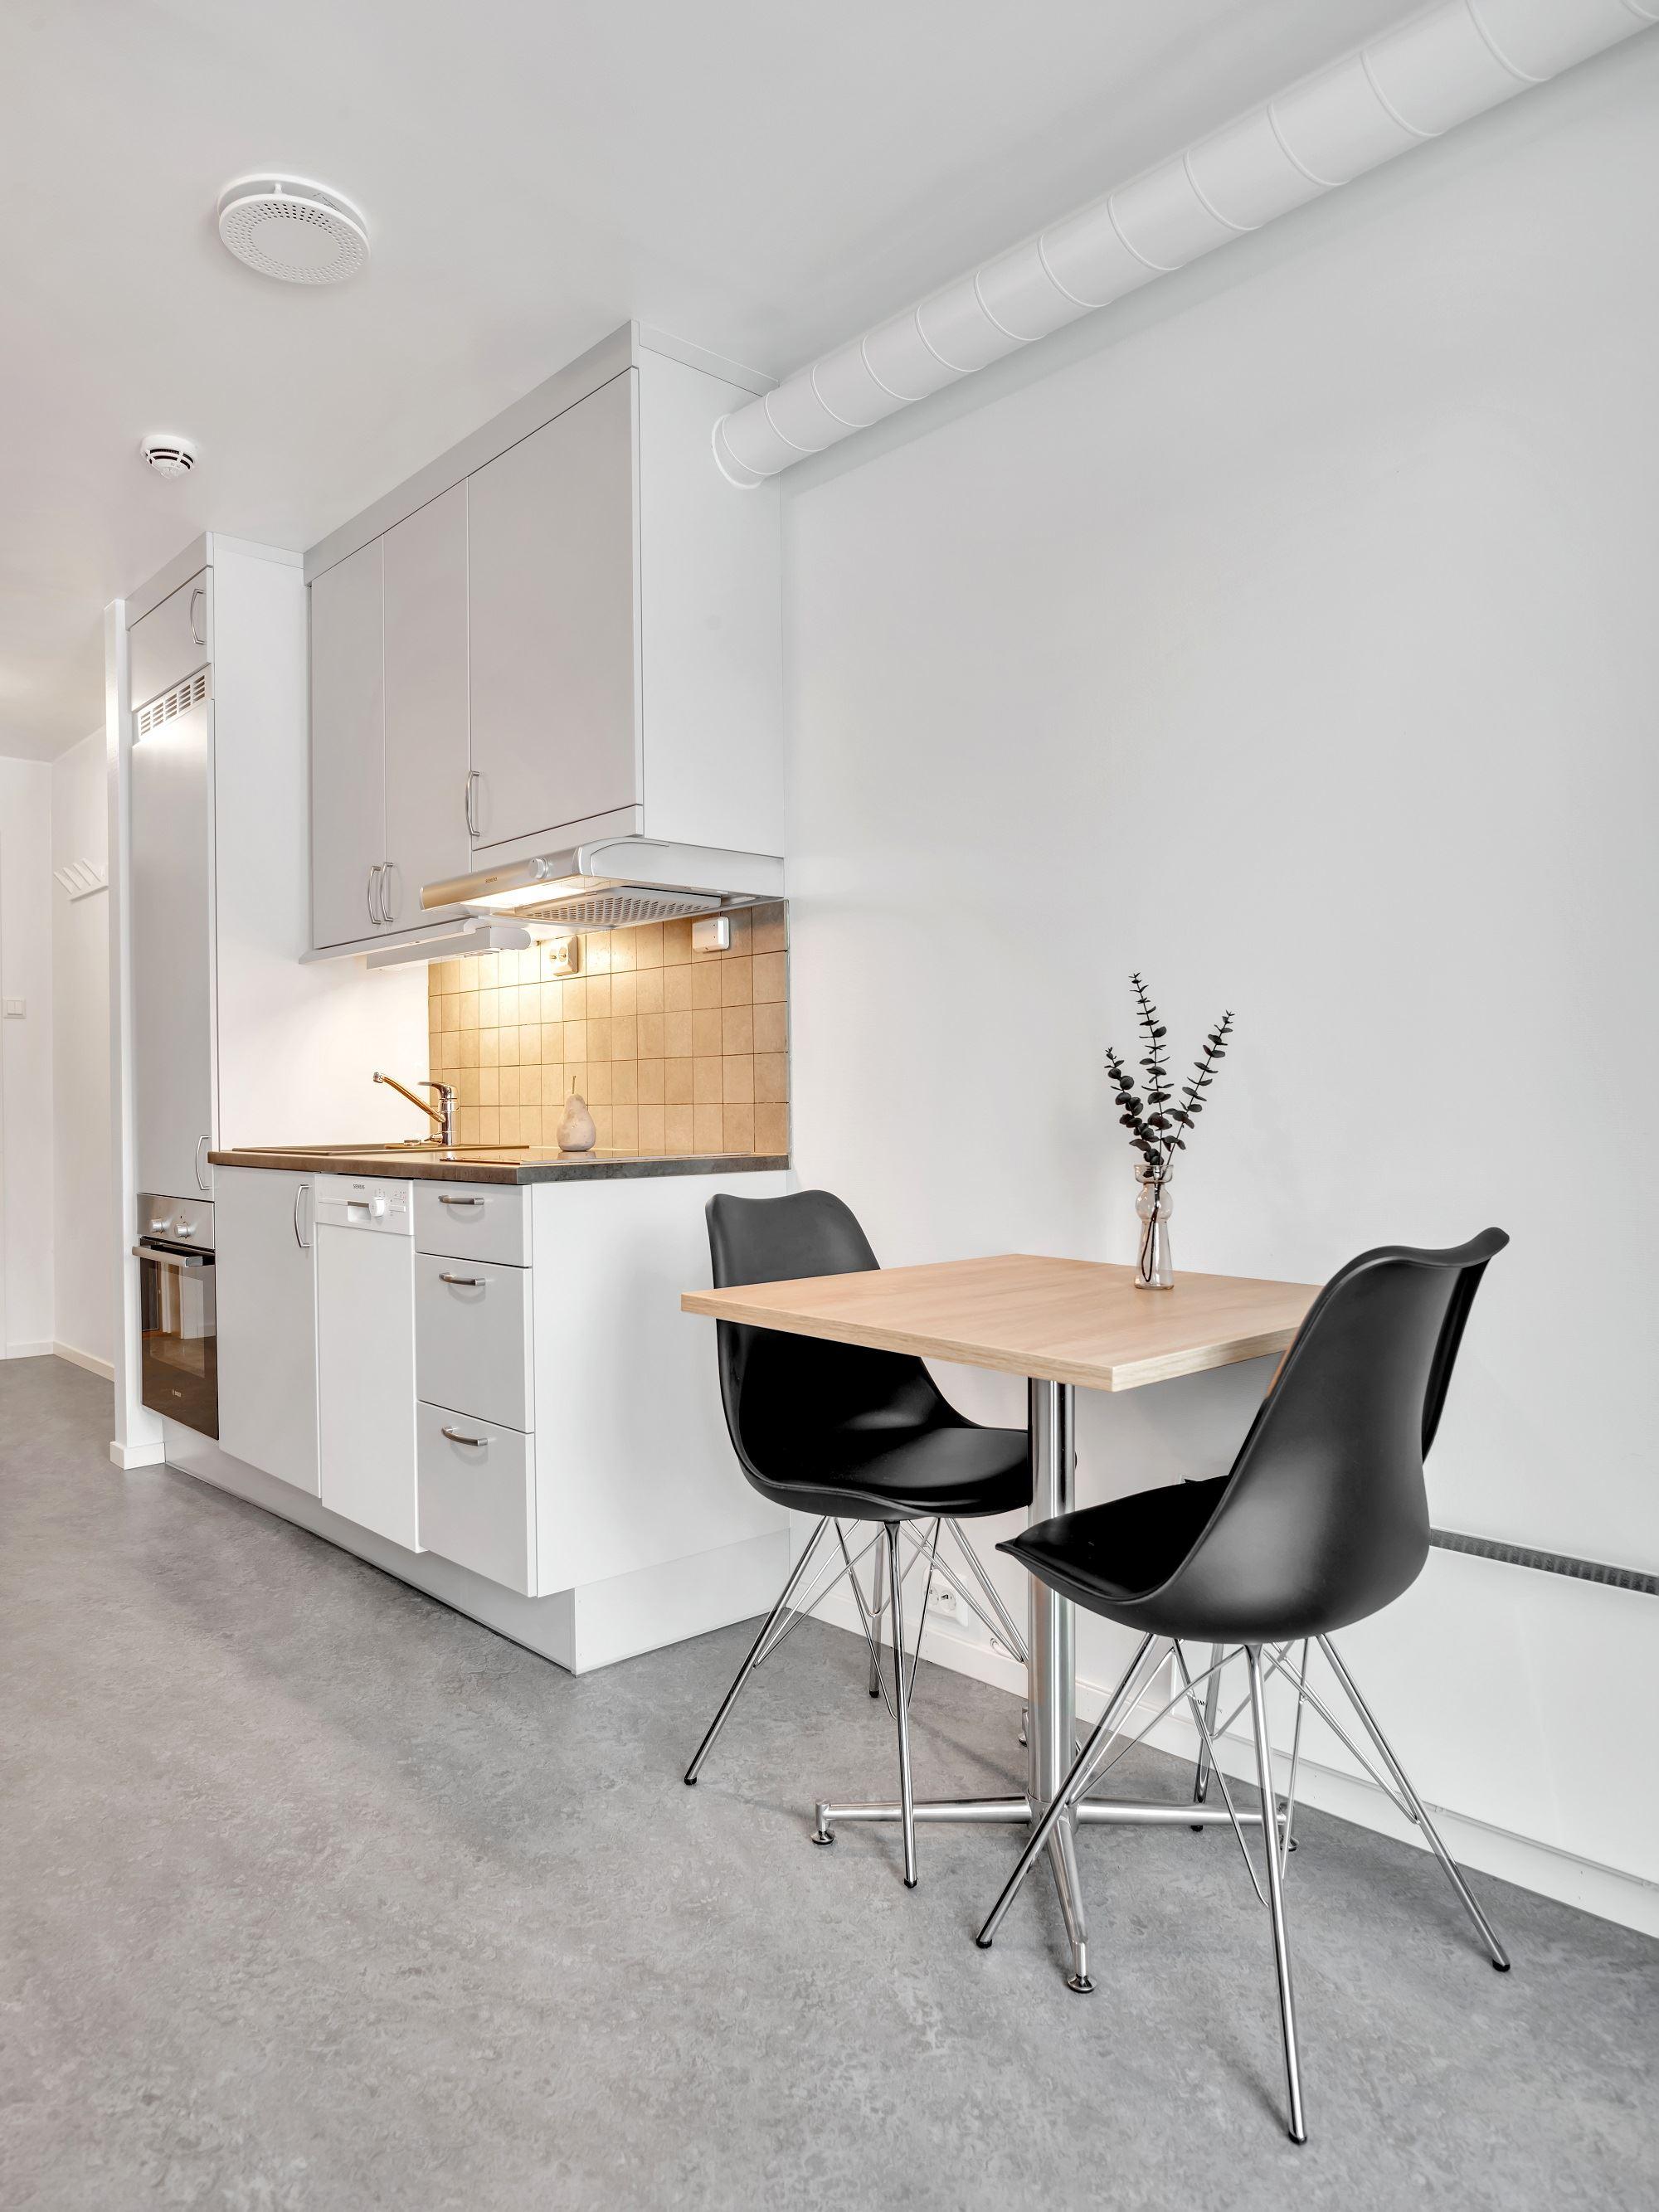 North of Lyngen Apartments - Leilighetshotell